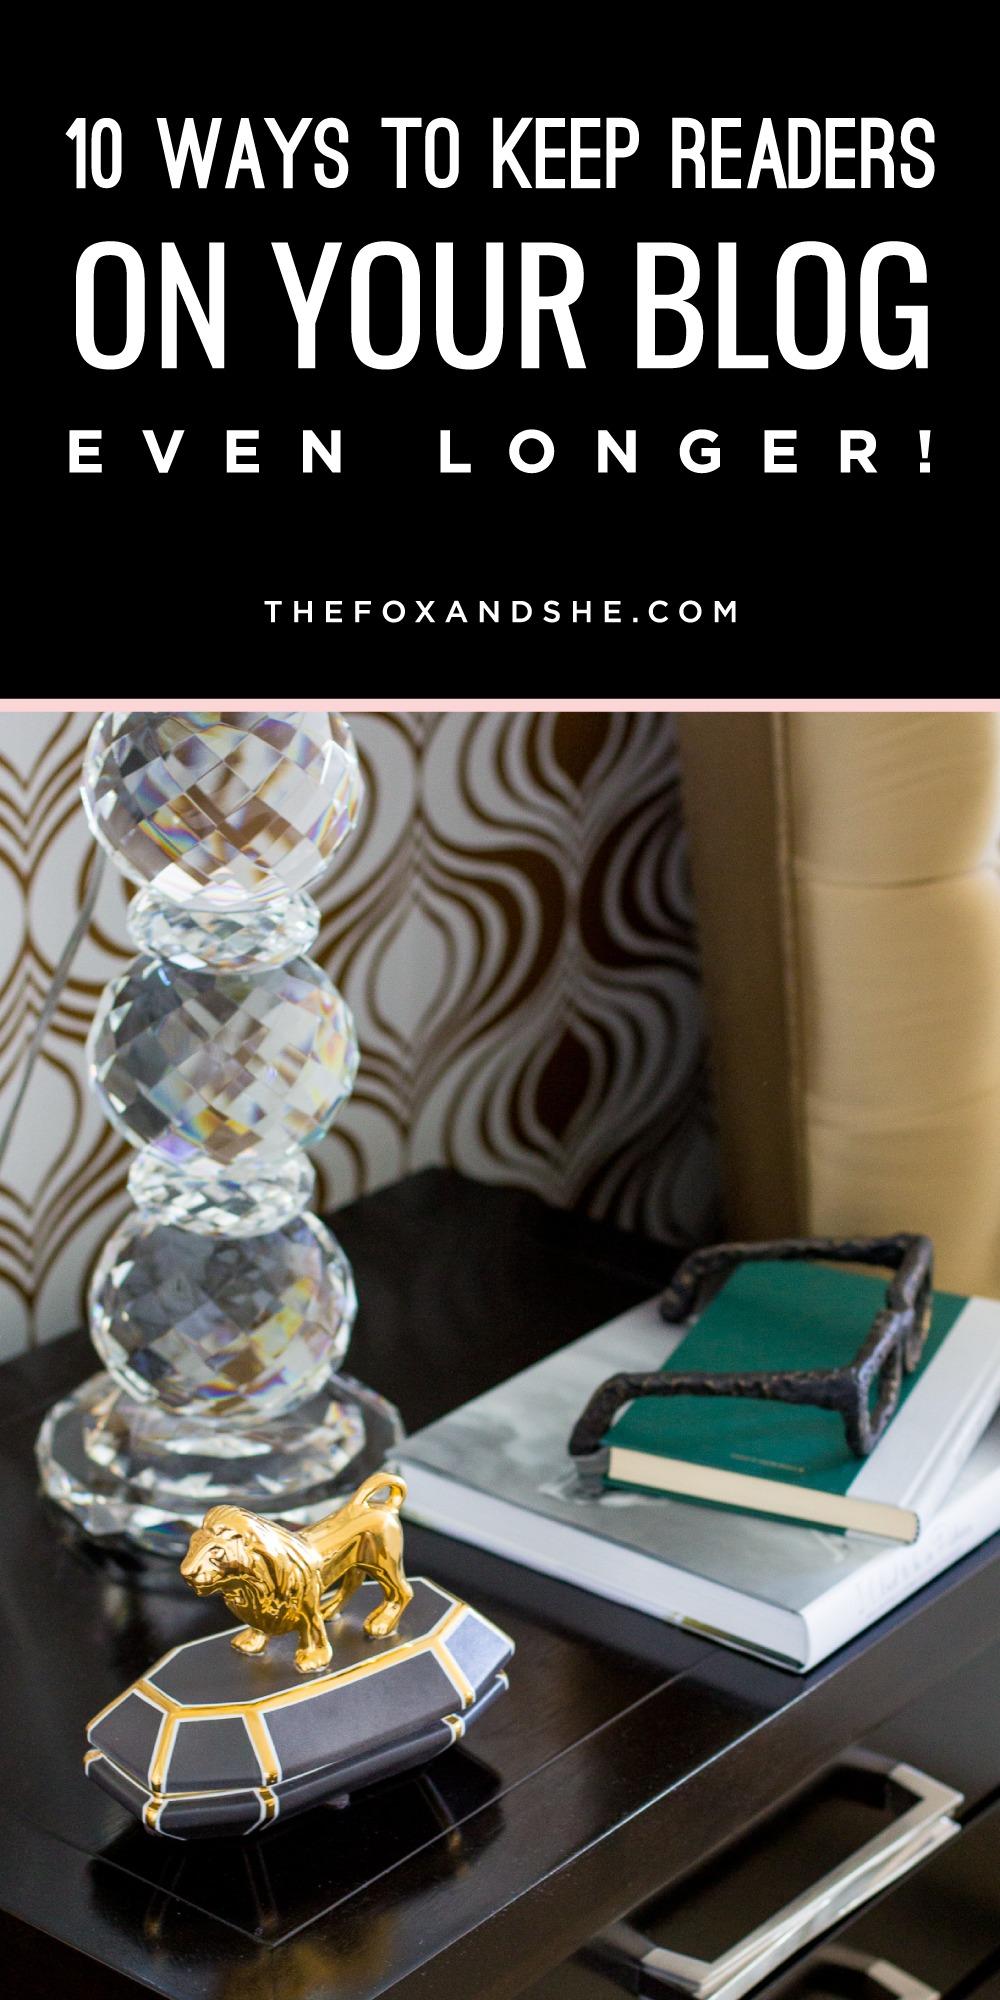 10 Ways to Keep Readers on Your Blog Longer —via @TheFoxandShe